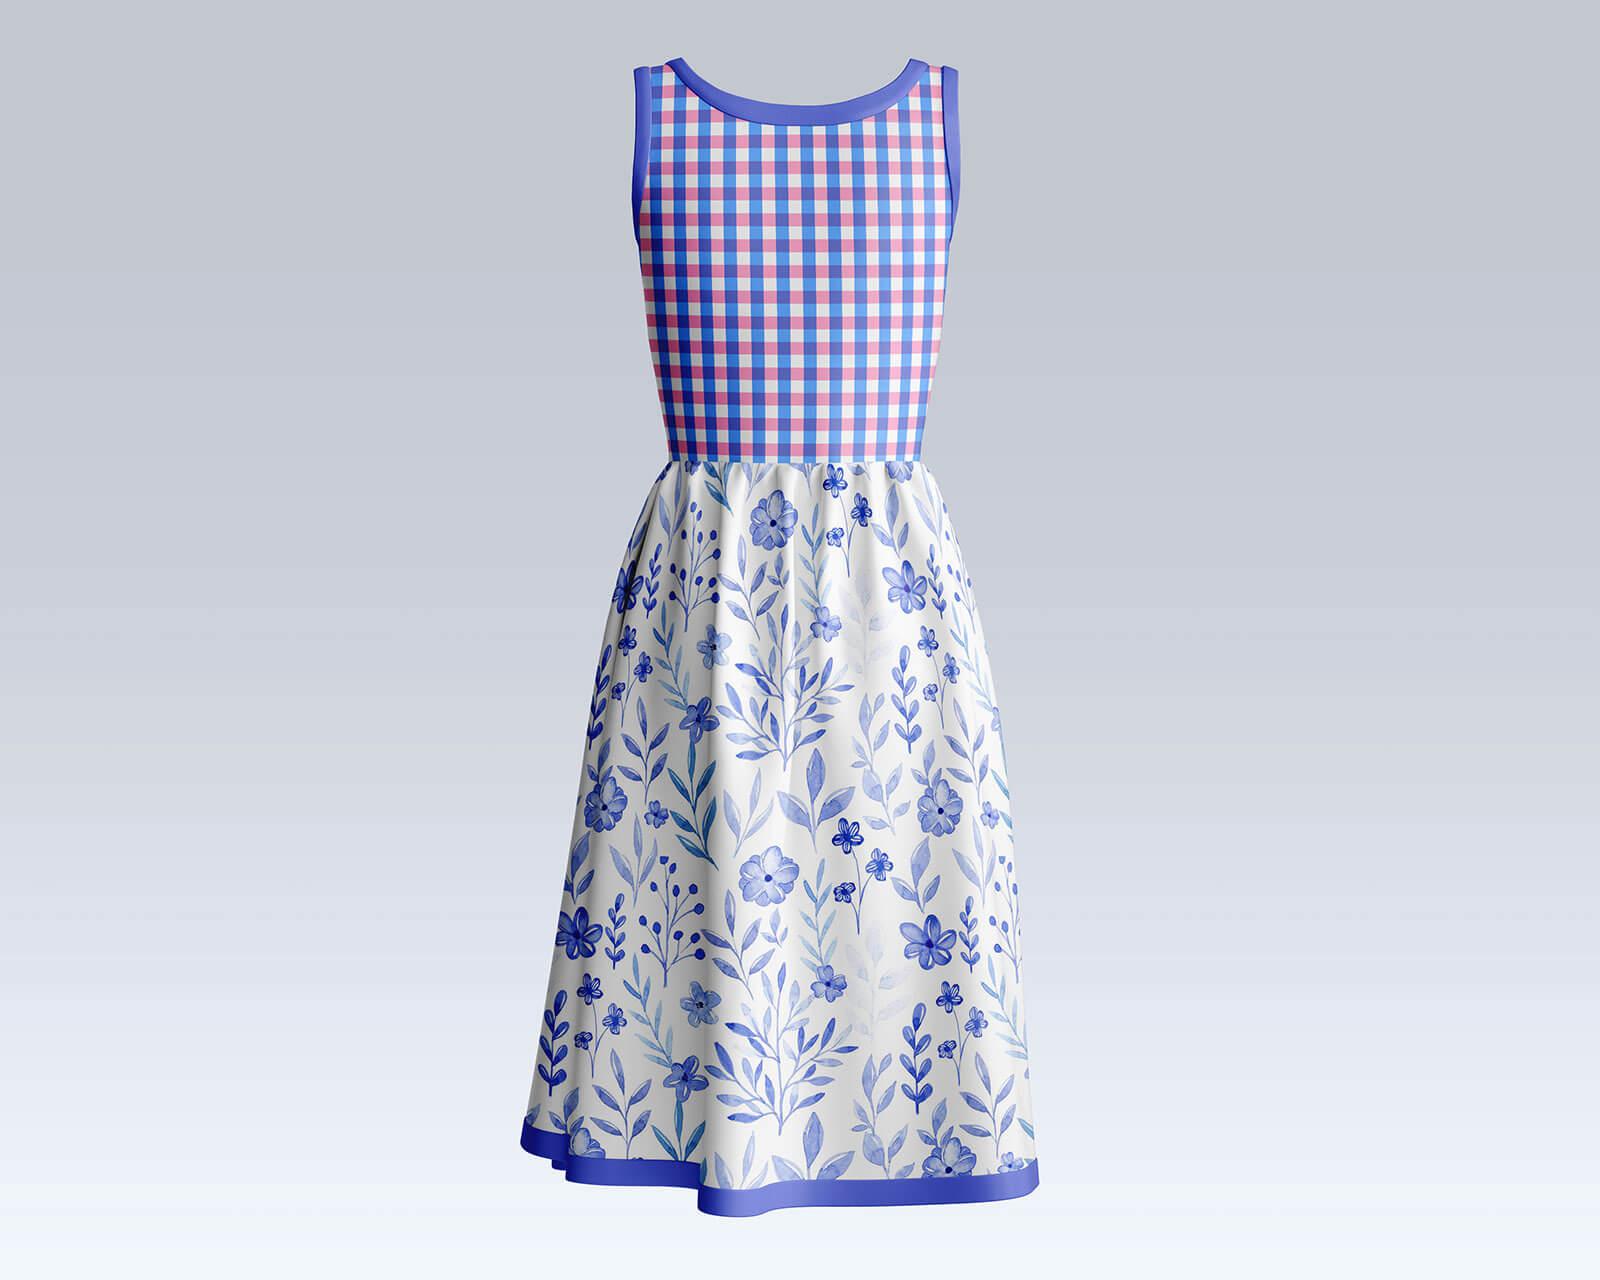 Free Sleeveless Women Summer Dress Mockup PSD Set (1)